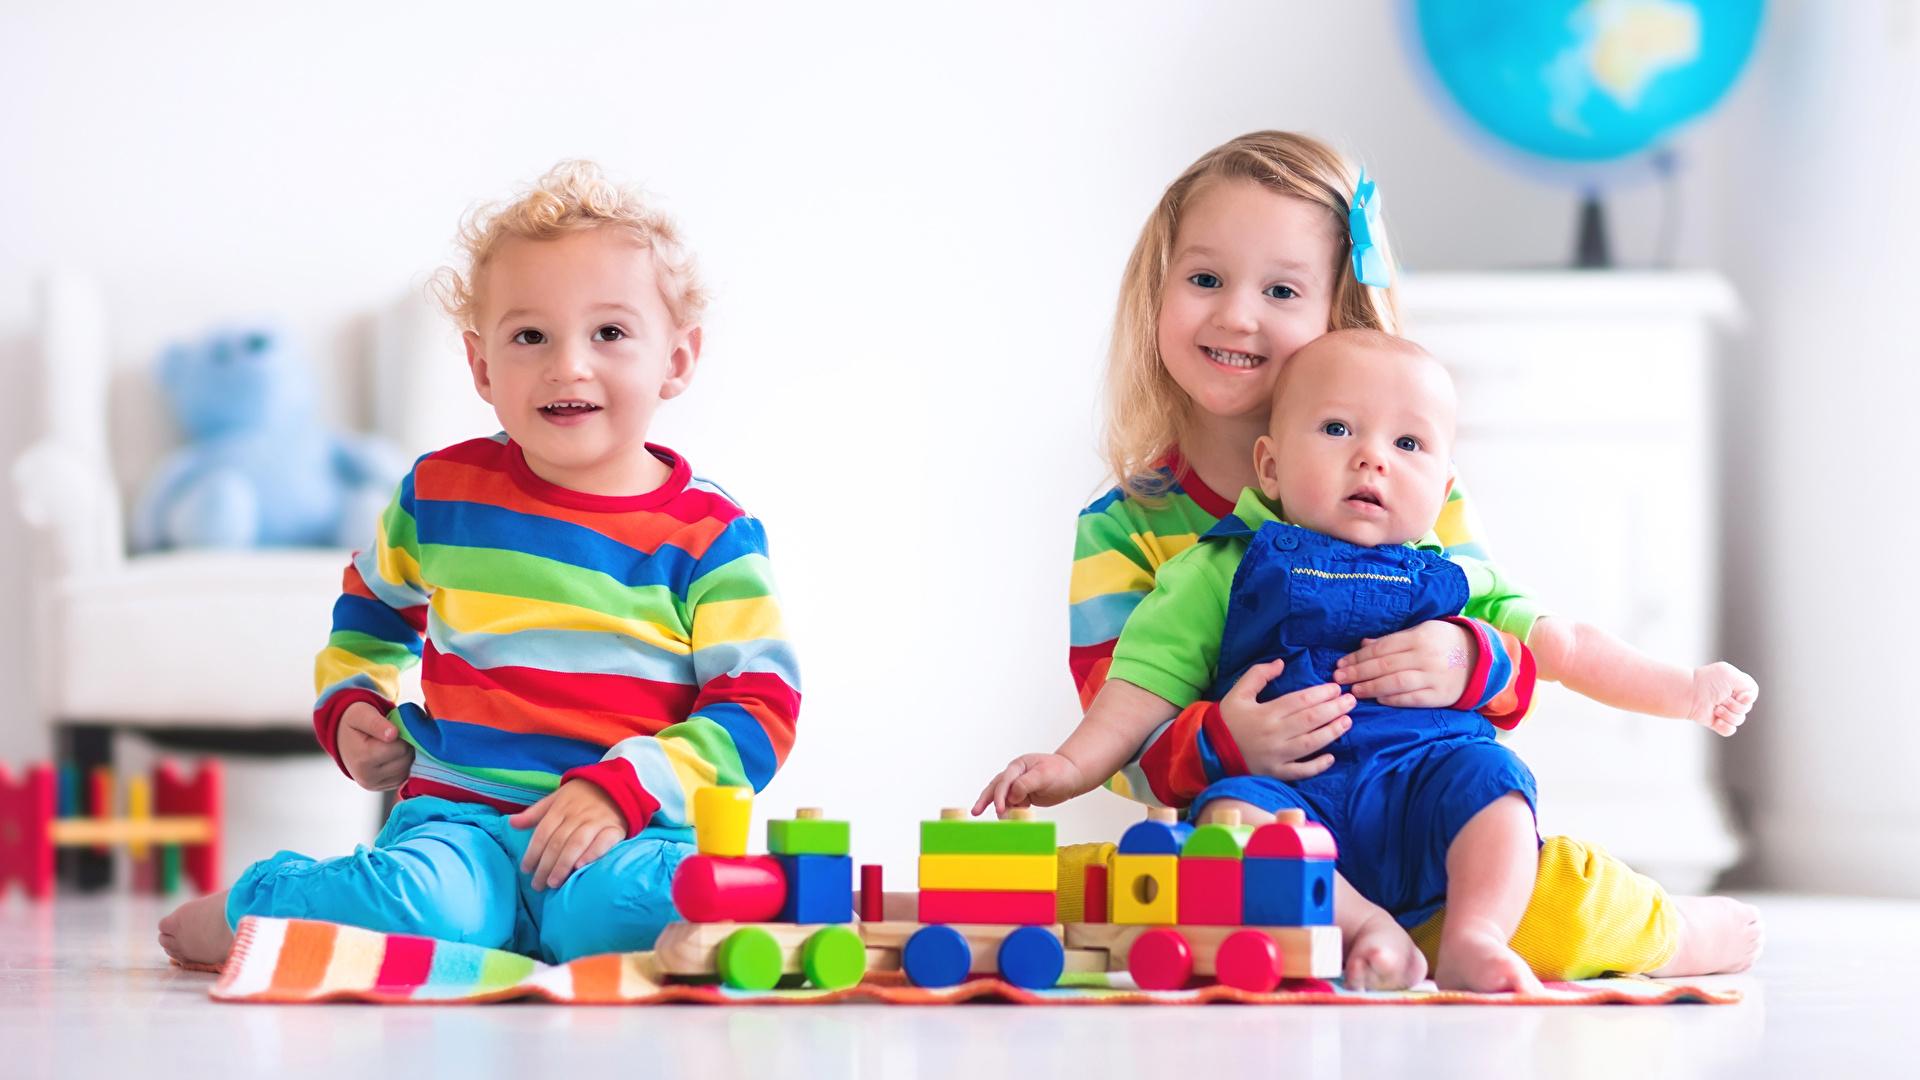 s Little girls Baby Boys Smile Children Three 3 Toys